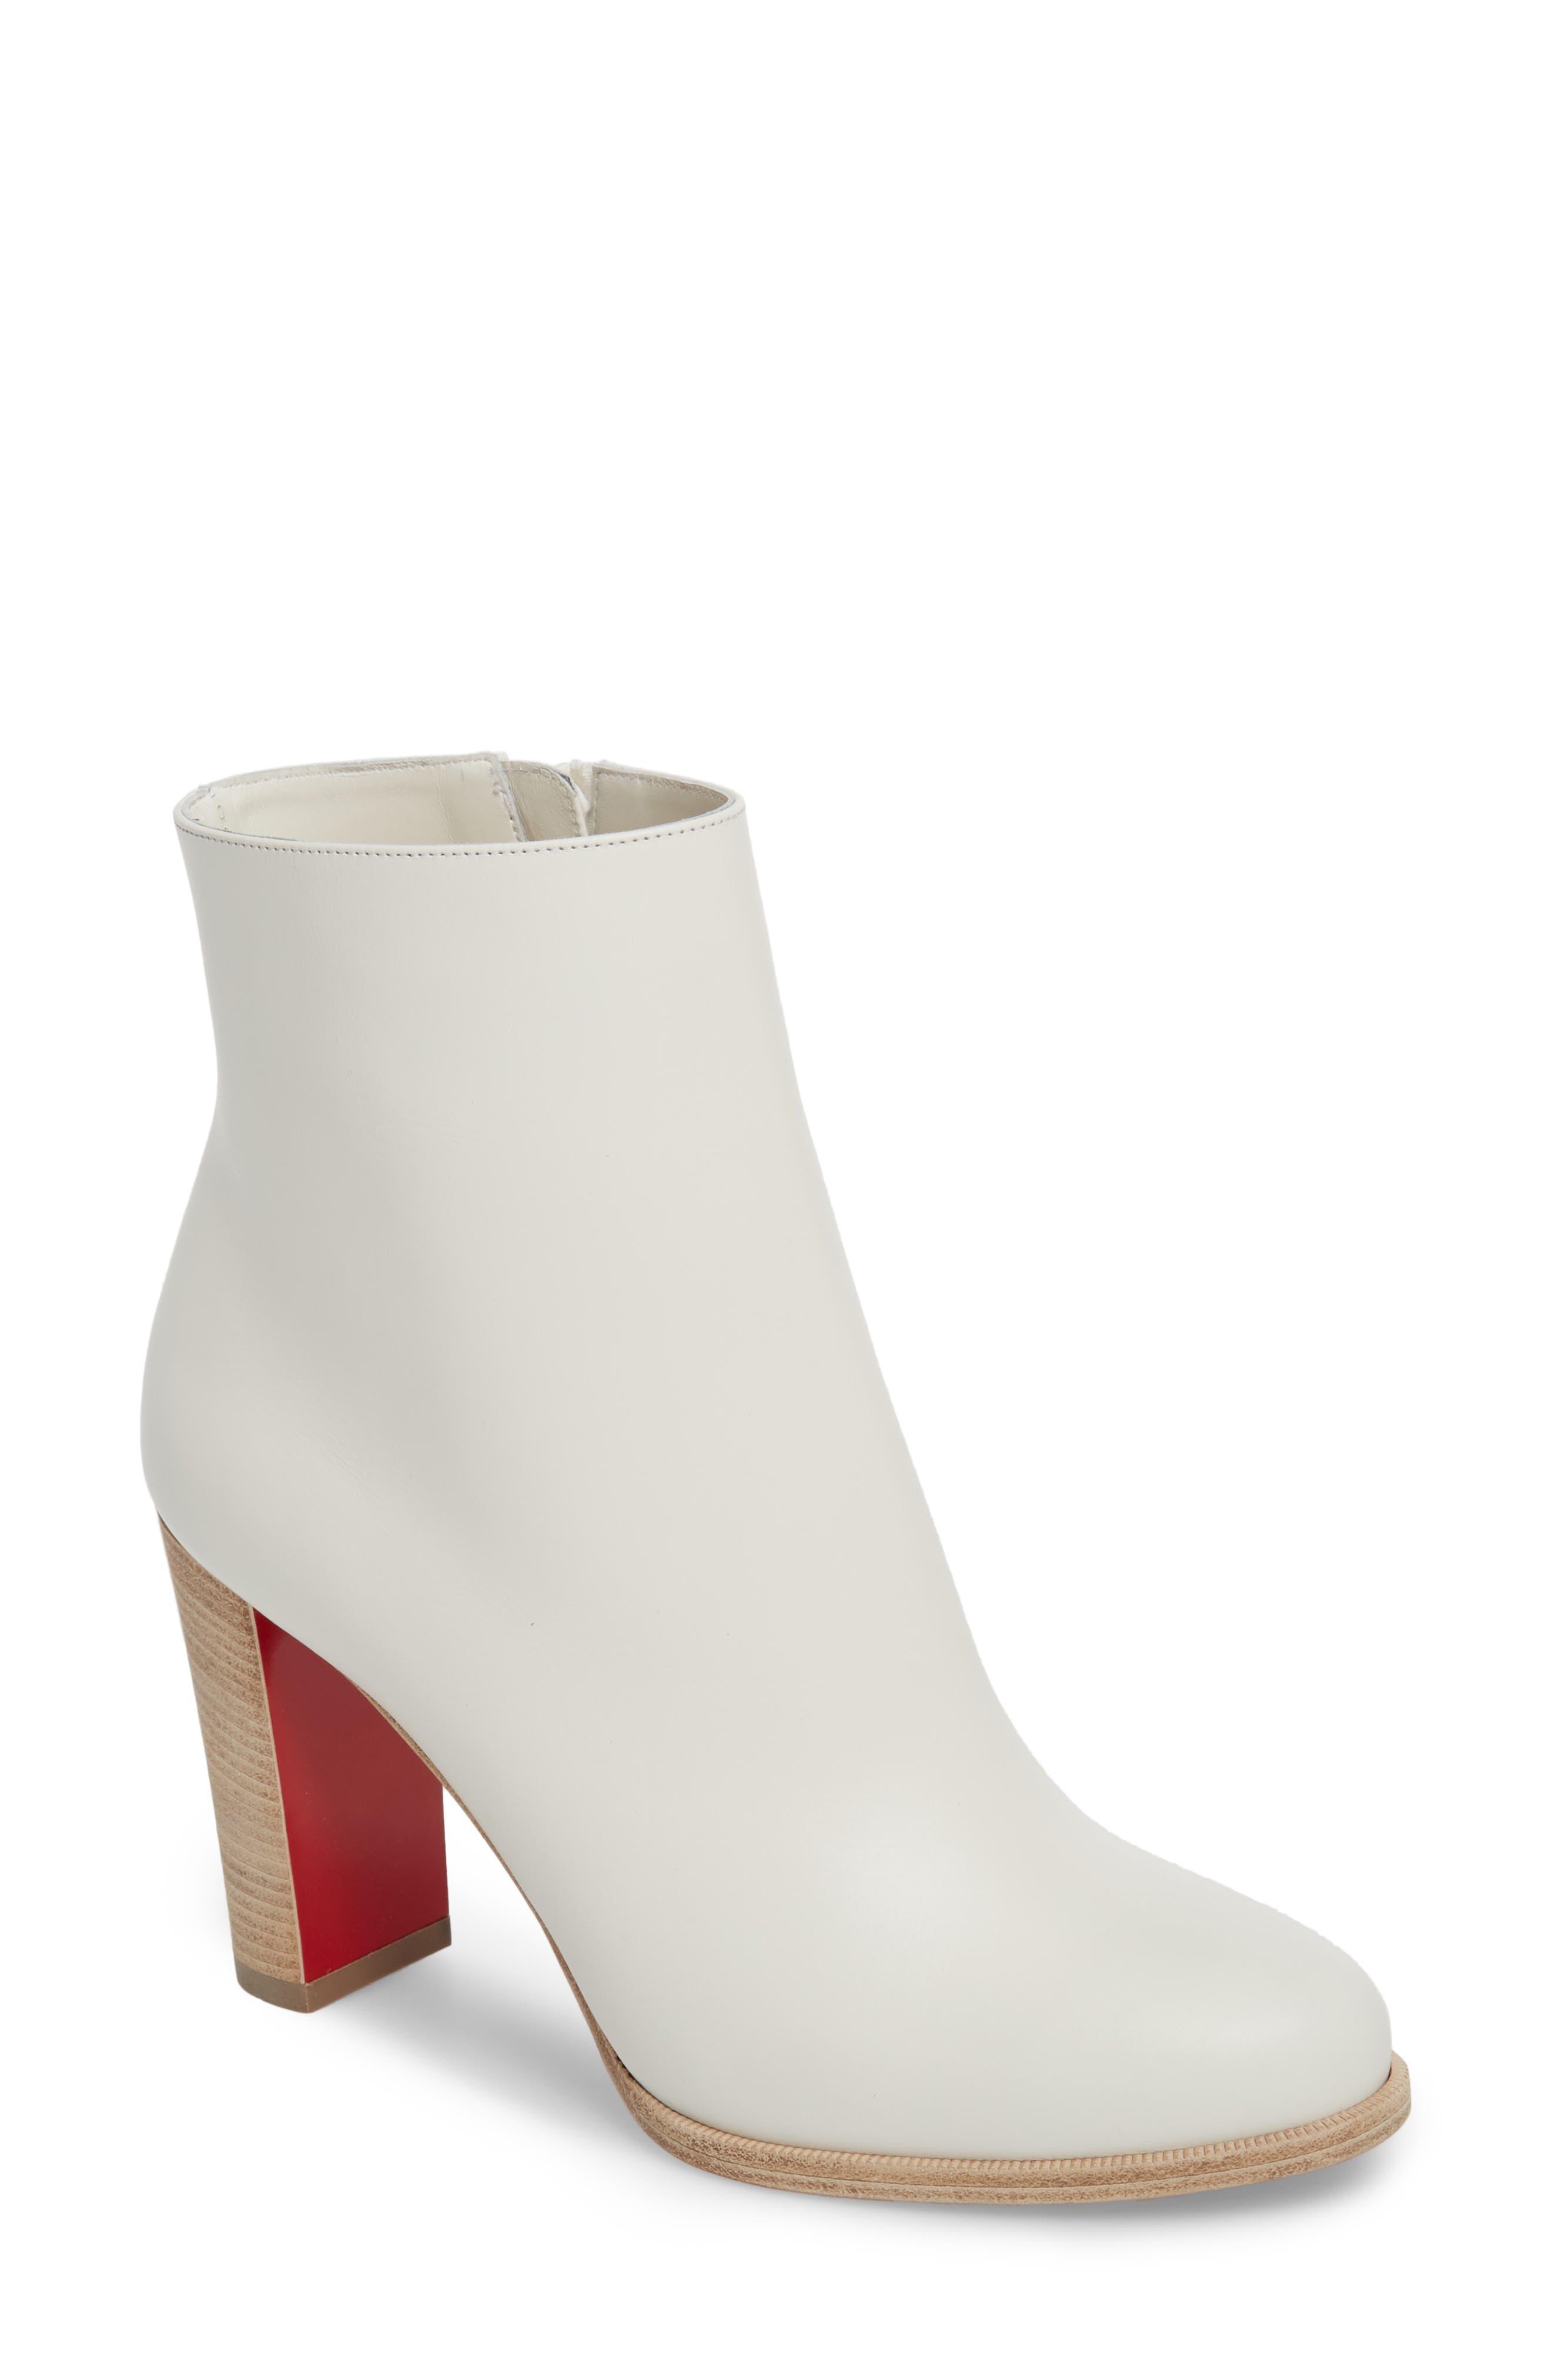 Adox Boot,                         Main,                         color, LATTE